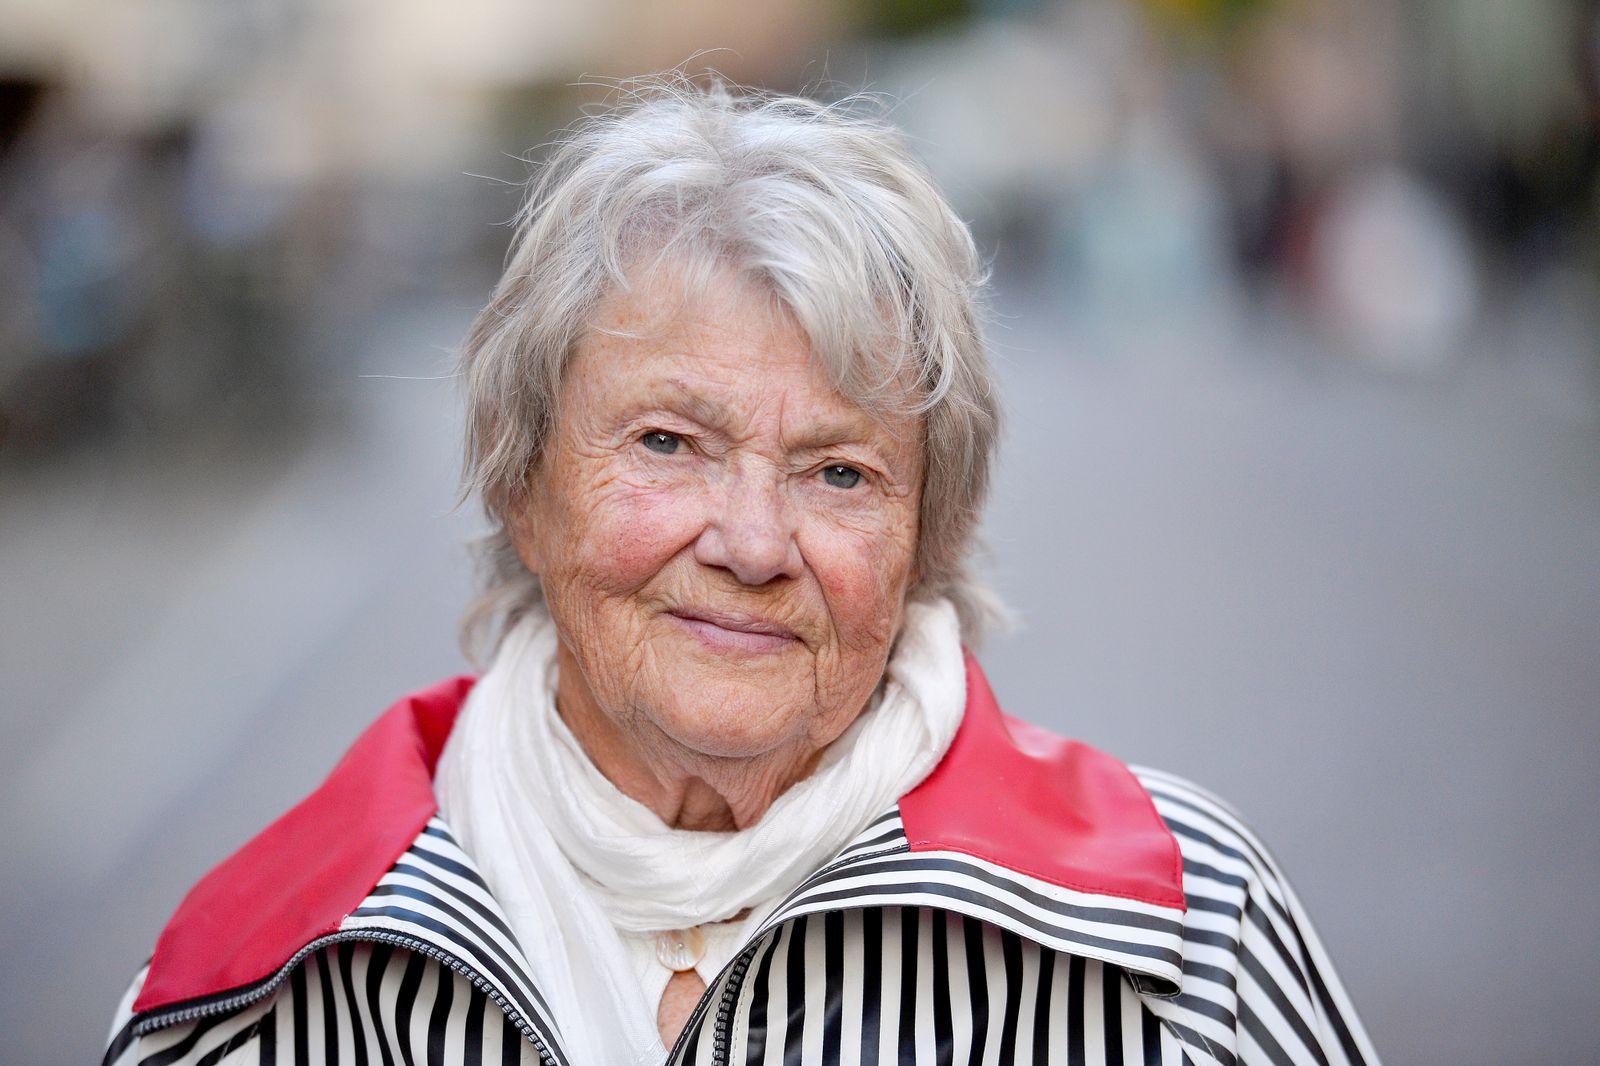 Swedish crime author Maj Sjowall